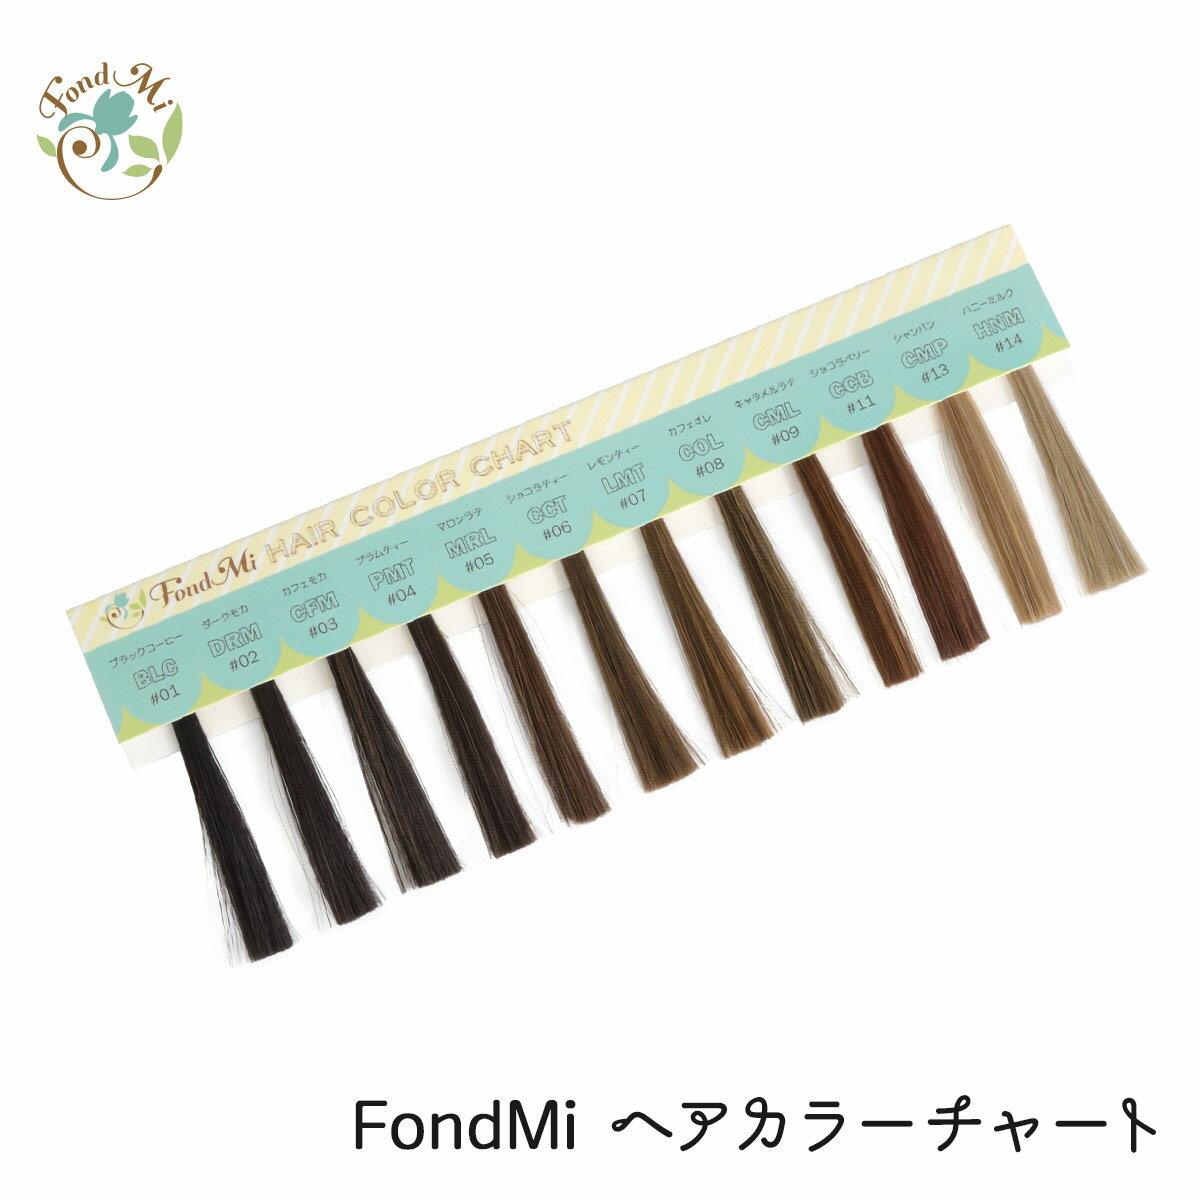 FondMi ヘアカラーチャート DM便送料無料 全12色 ウィッグ、エクステ用カラーサンプル カラー見本 フォンドミィ